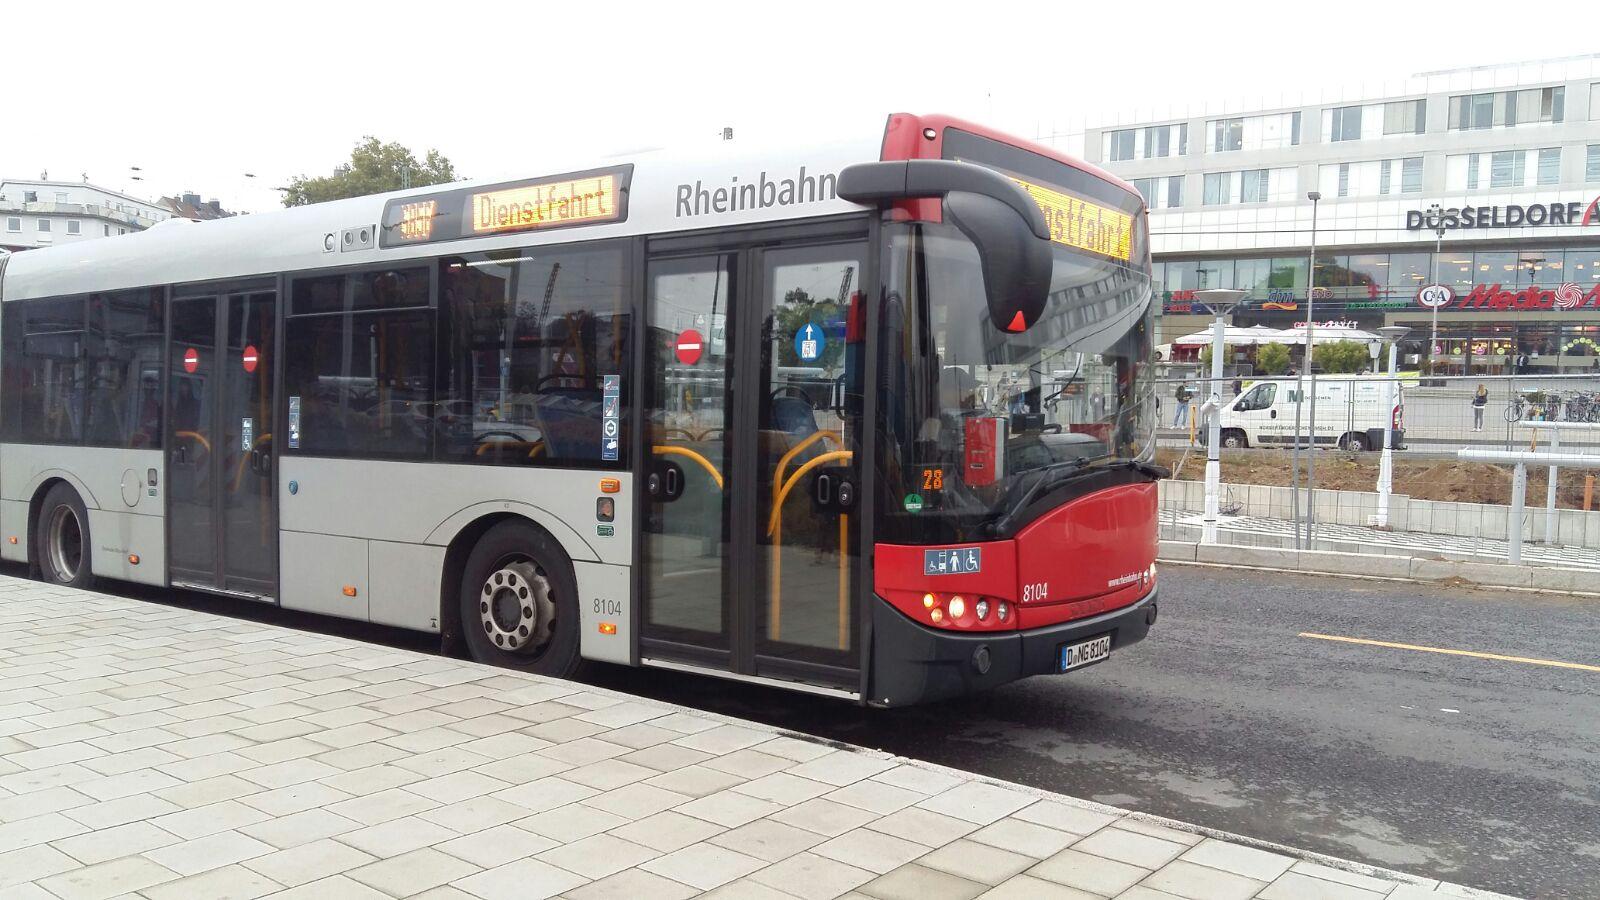 Sperrung der Urdenbacher Allee: Sechs Buslinien fahren Umleitungen (Foto: xity)